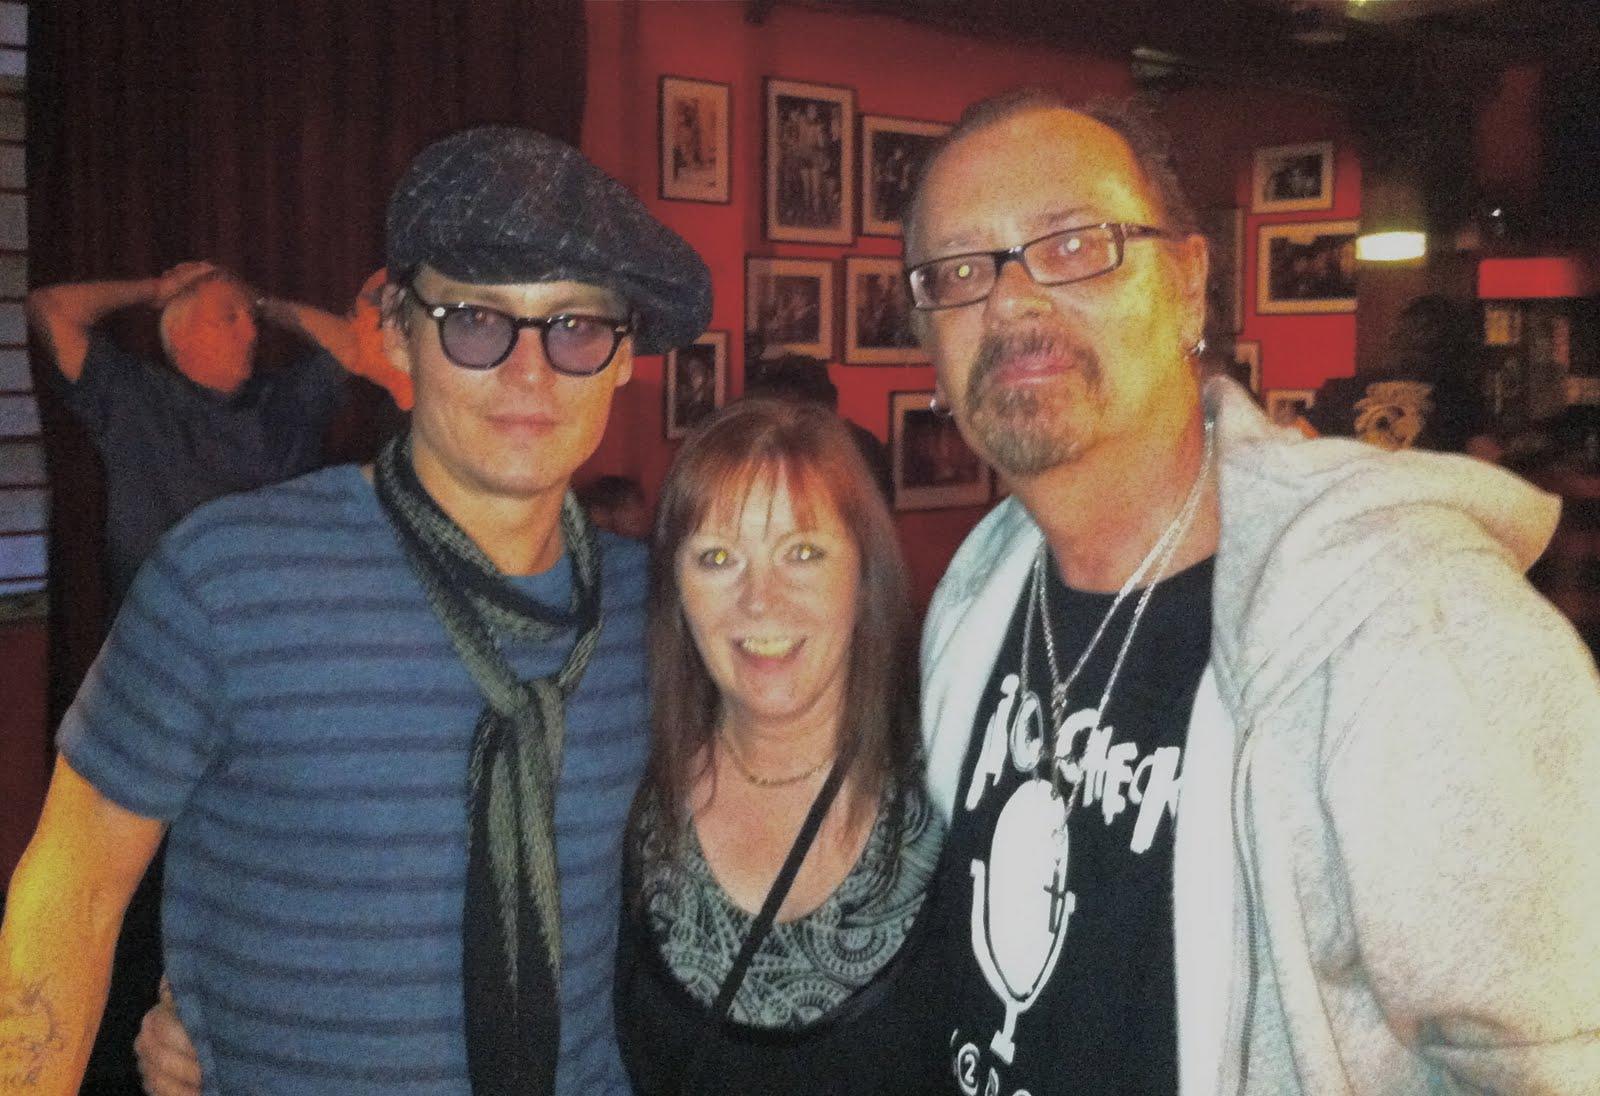 http://1.bp.blogspot.com/-wxBiwQuSfv8/Tg4l9bhIOSI/AAAAAAAAAGI/ZQQyho9f3Hk/s1600/Johnny+and+us.jpg